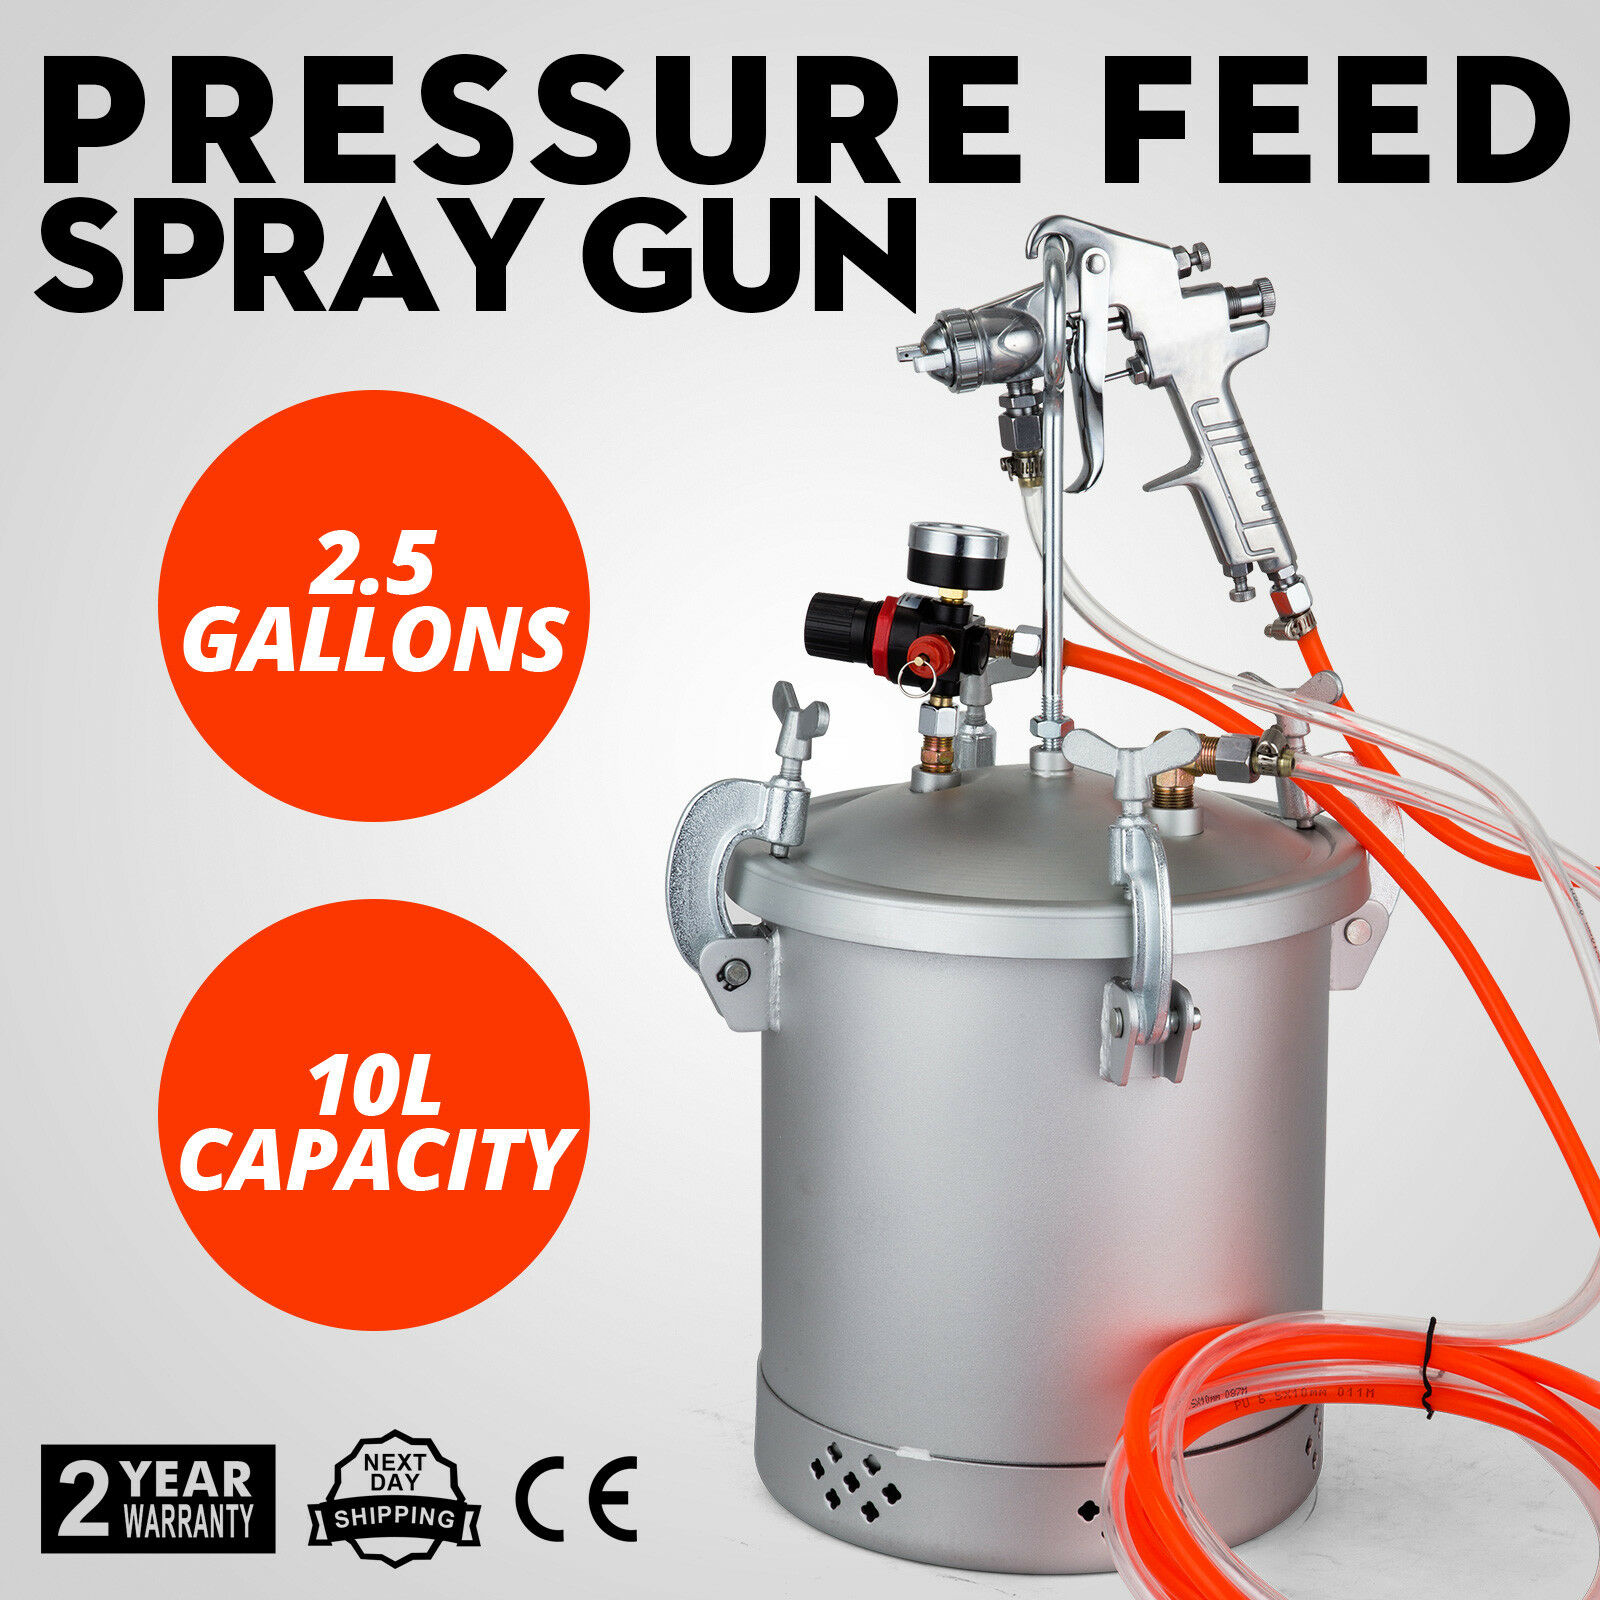 New 2-1/2 Gallon Pressure Feed Paint Tank Pot Spray Gun Sprayer System